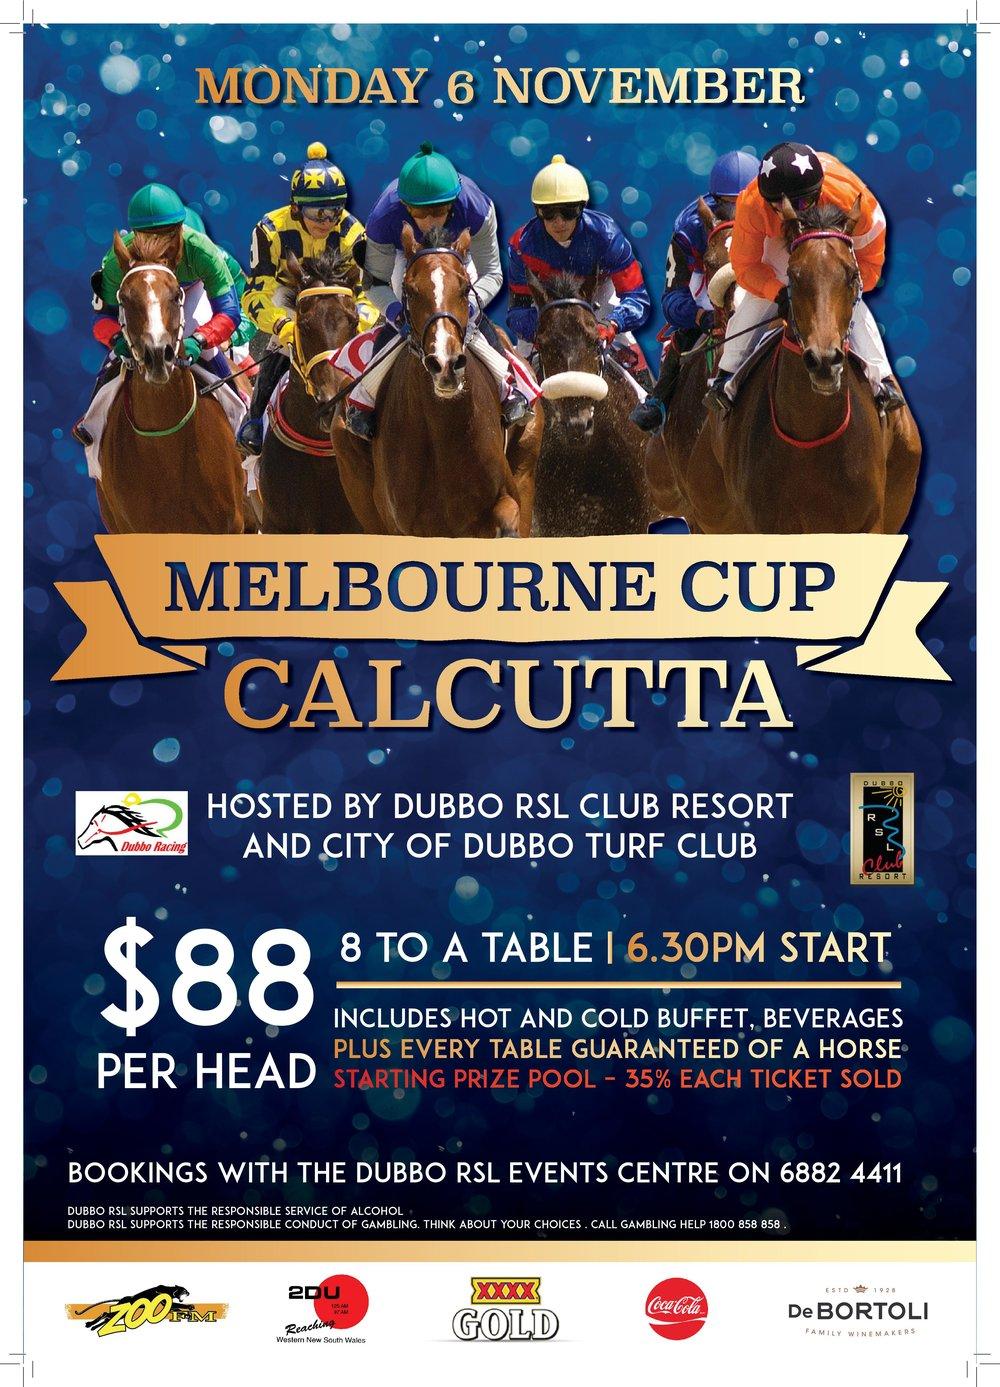 Melbourne_cup_calcutta_v4_PrintReady-page-001 (1).jpg